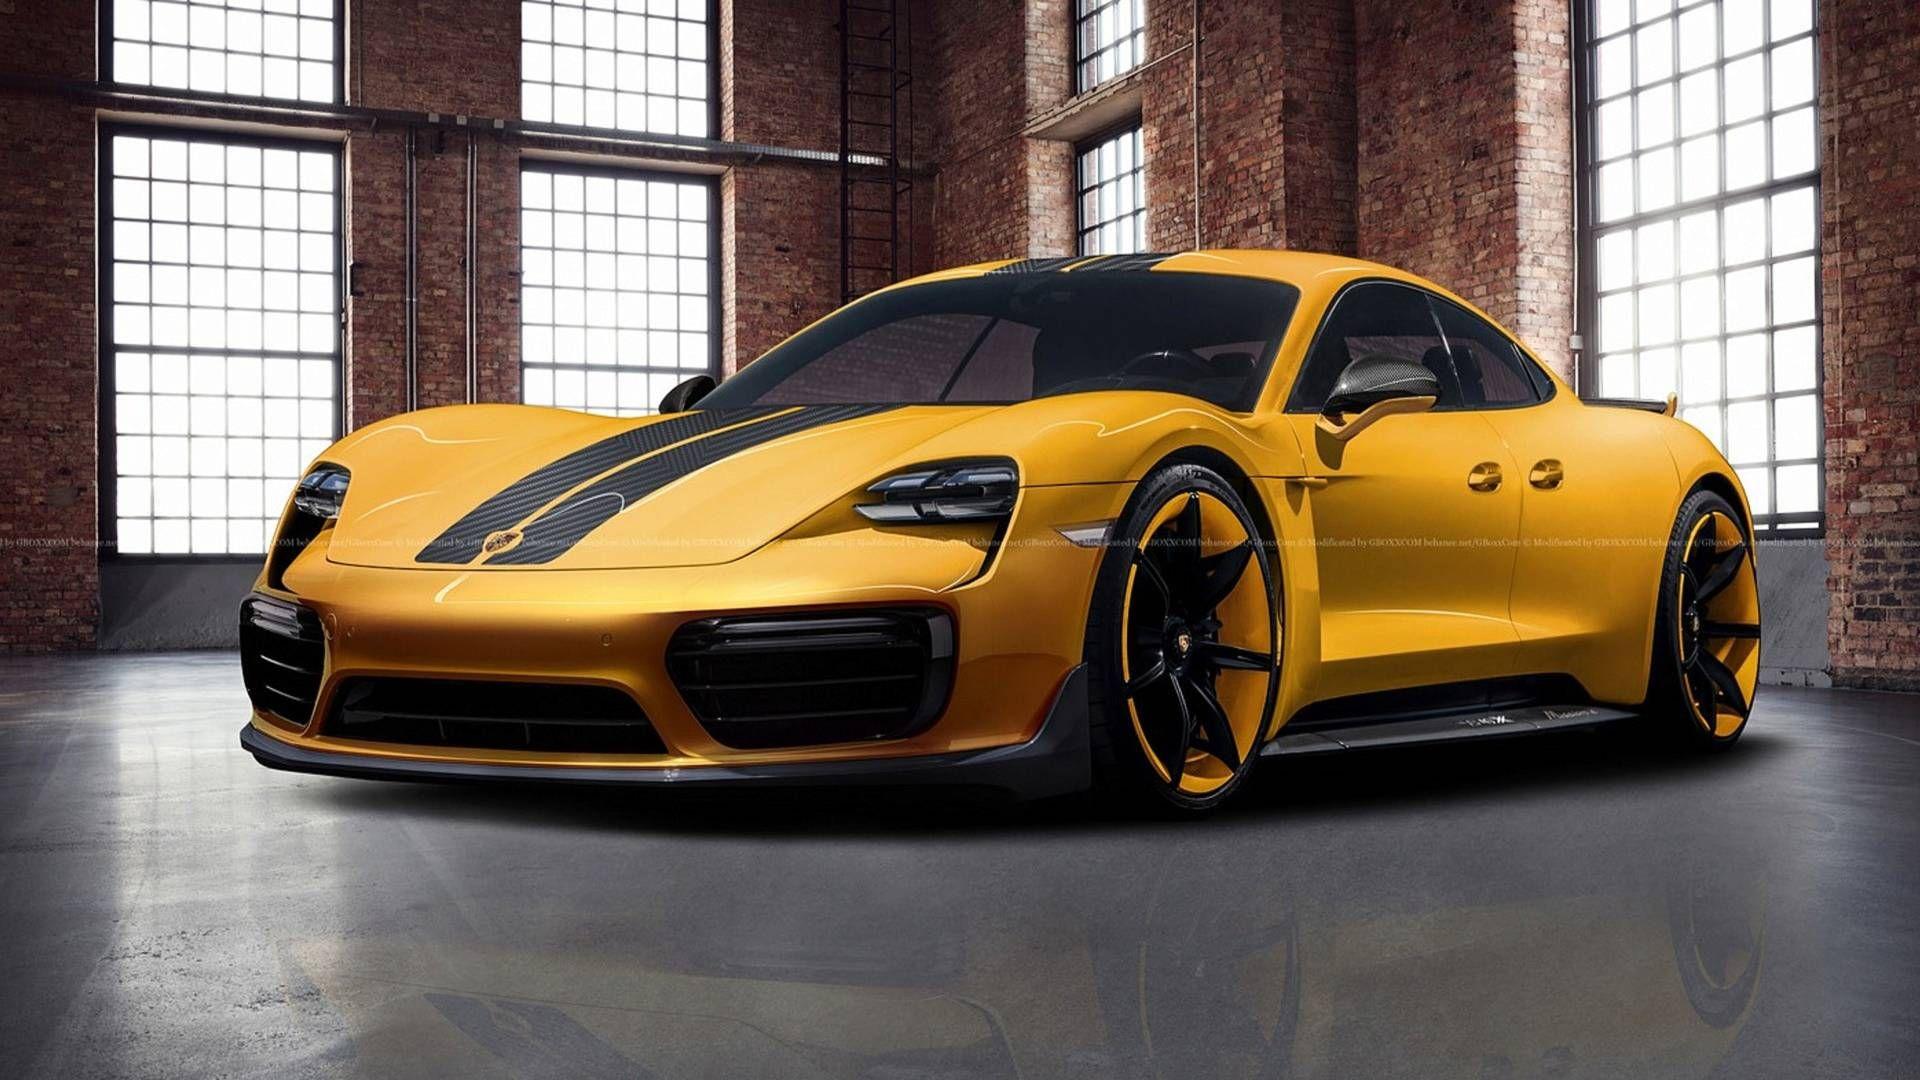 Porsche Officially Waves Diesel Models Goodbye With Images Porsche Taycan Porsche Sports Cars